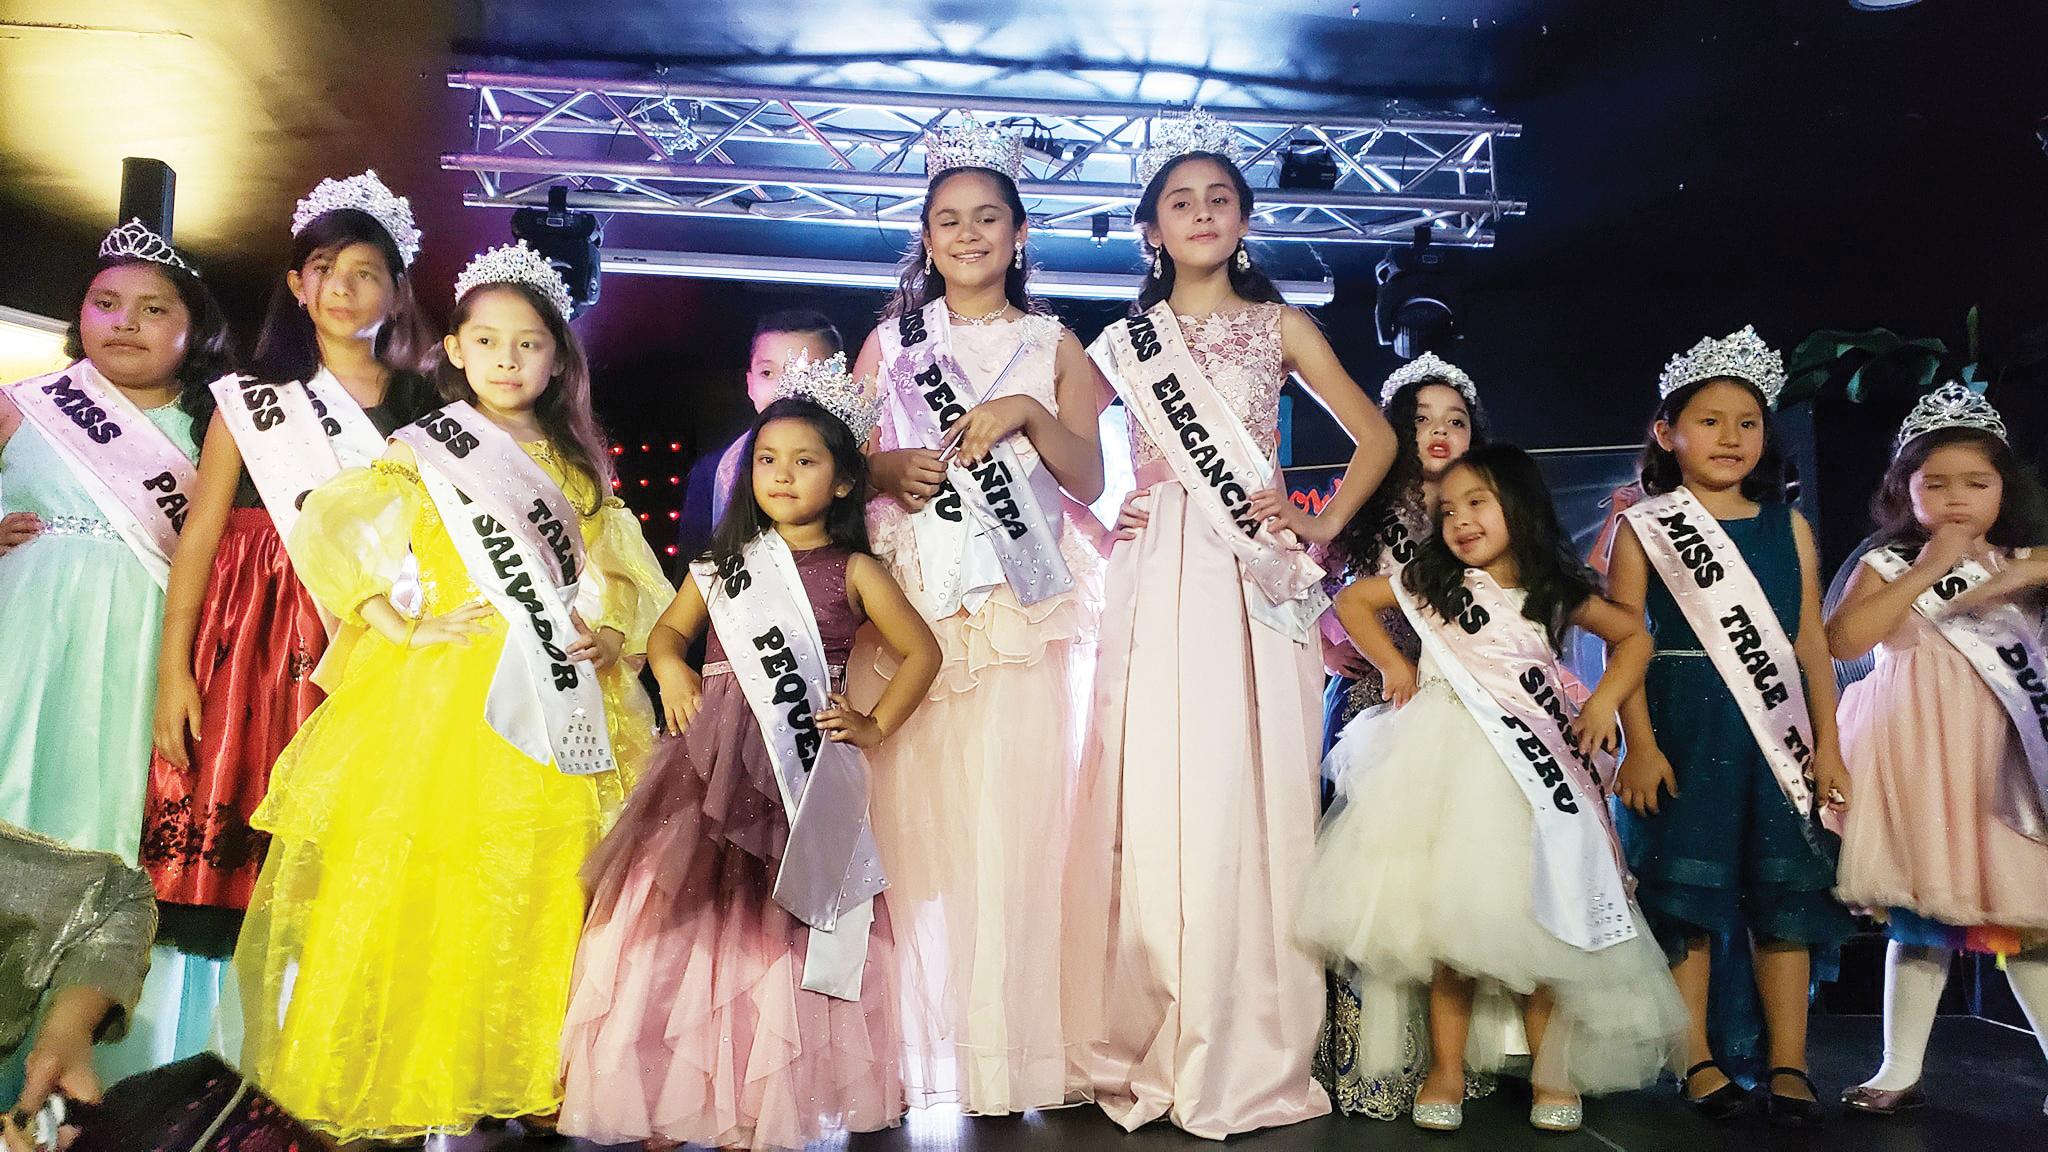 Miss Pequeñita Internacional  2019 tiene dos bellas reinas